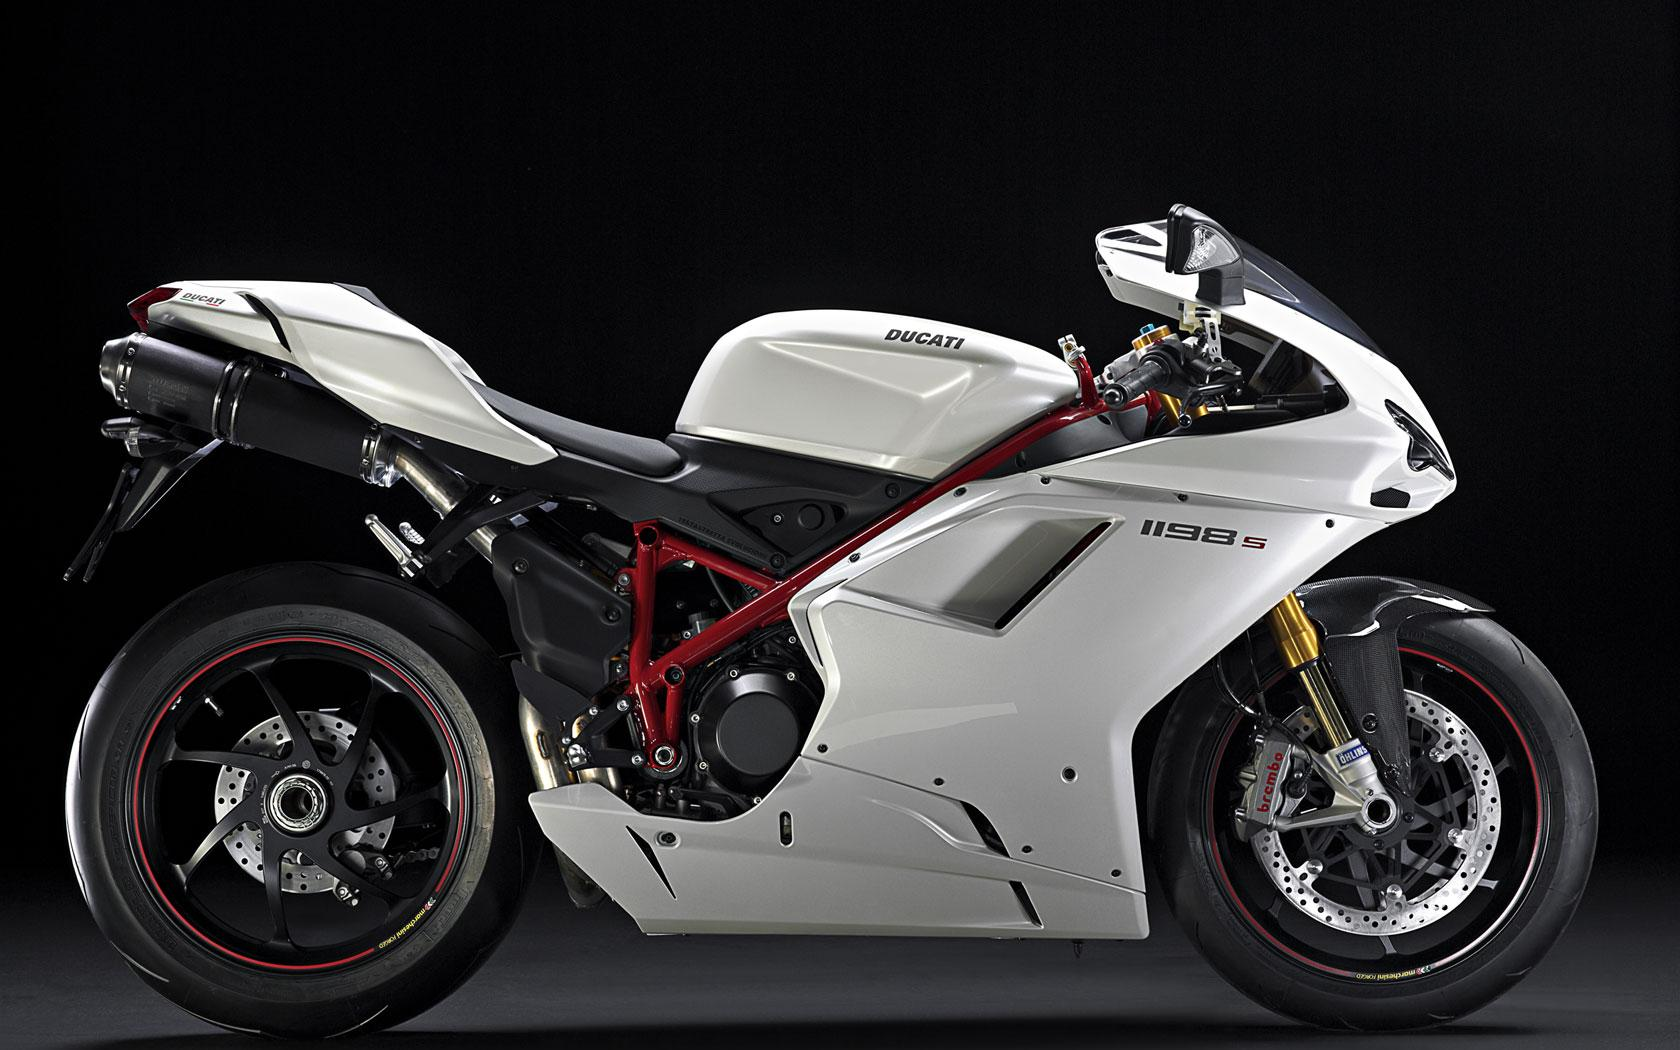 Ducati Motorcycle Wallpaper 7094 Hd Wallpapers in Bikes   Imagescicom 1680x1050